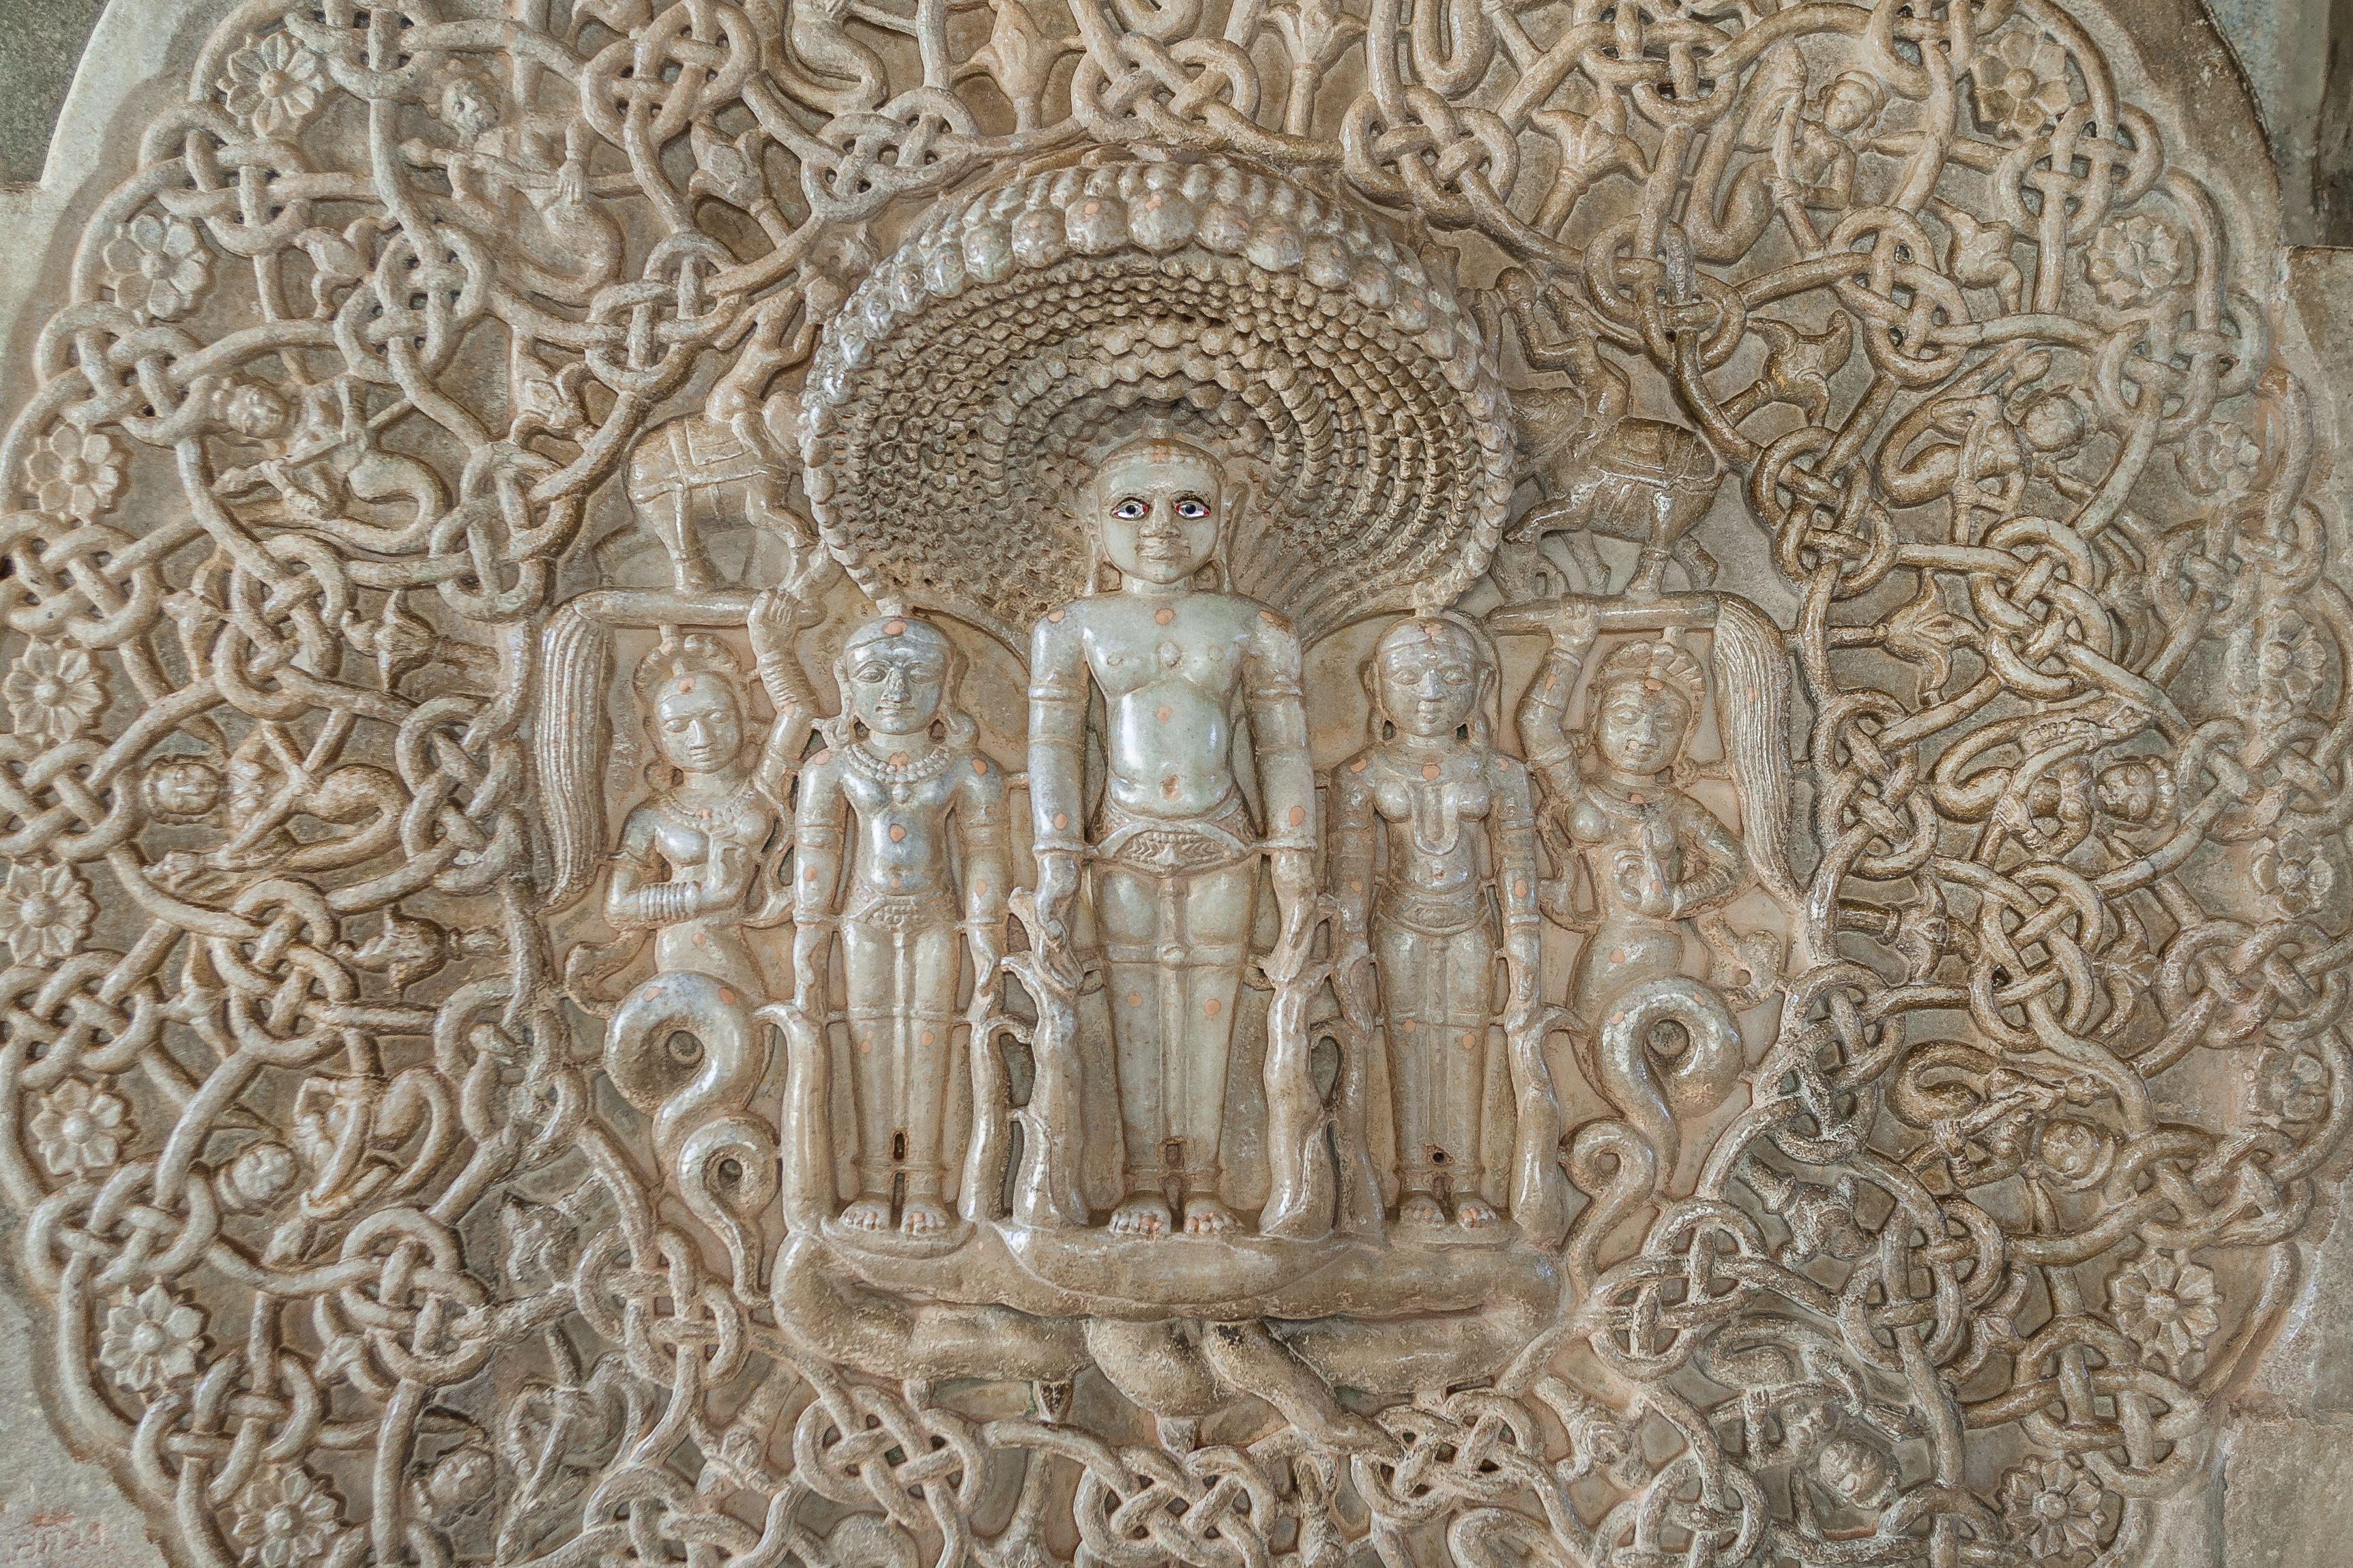 Jainism Beliefs: The Three Jewels